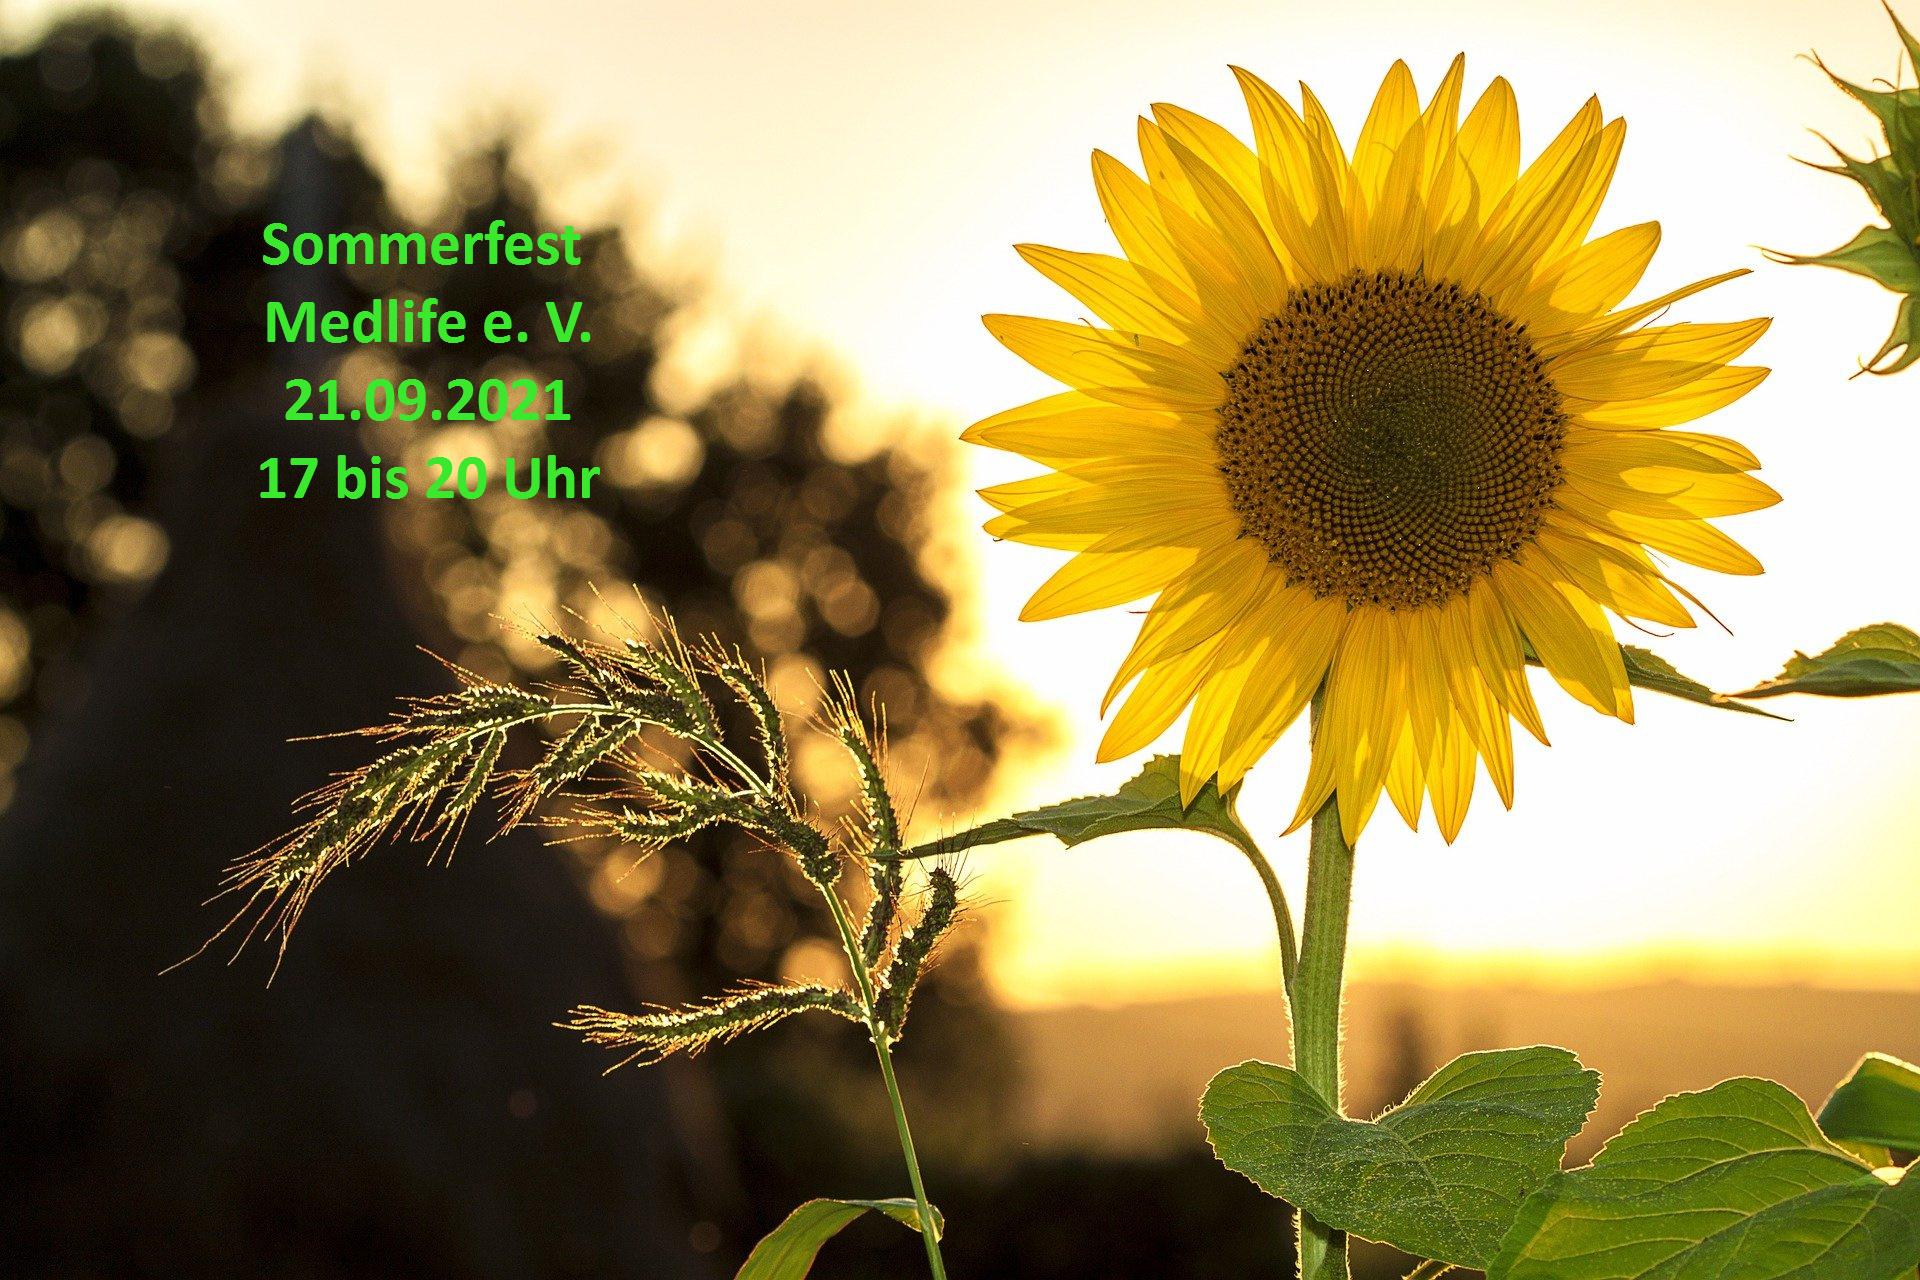 sunflower-1127174_1920-2